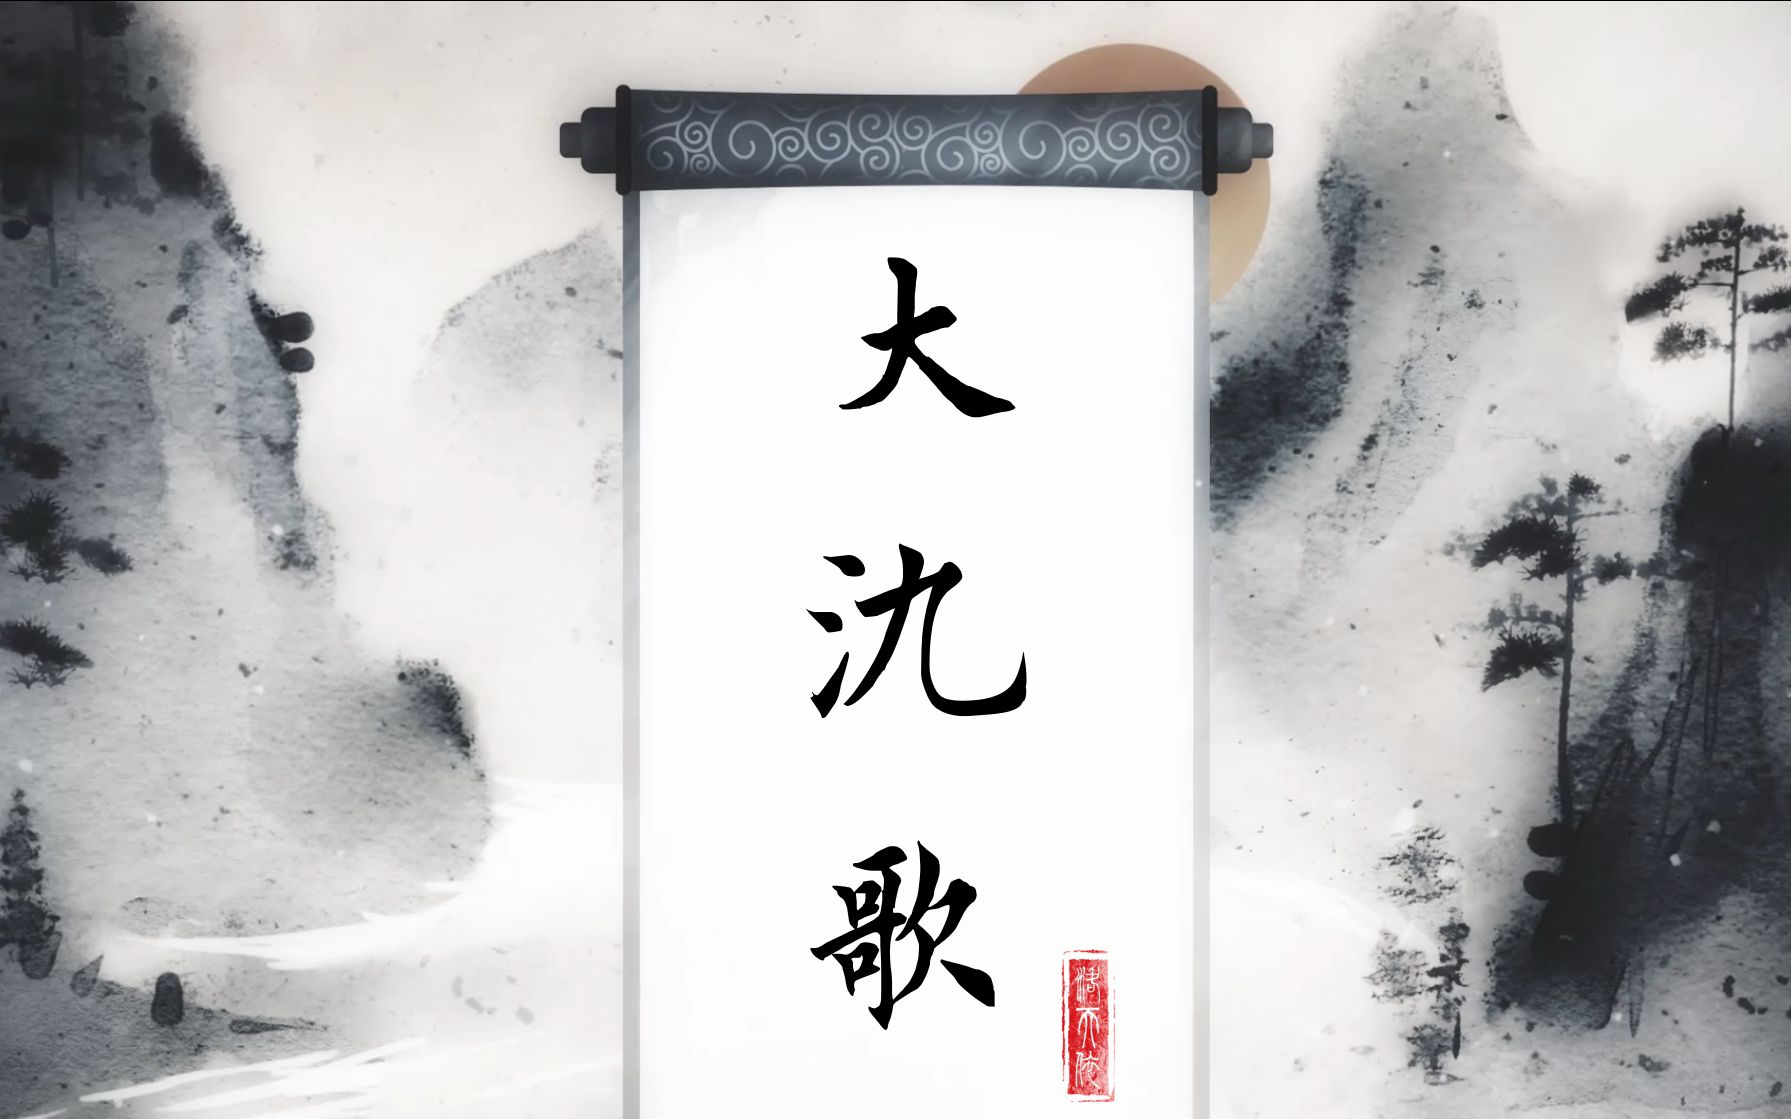 大氿歌 (Dà Jiǔ Gē)